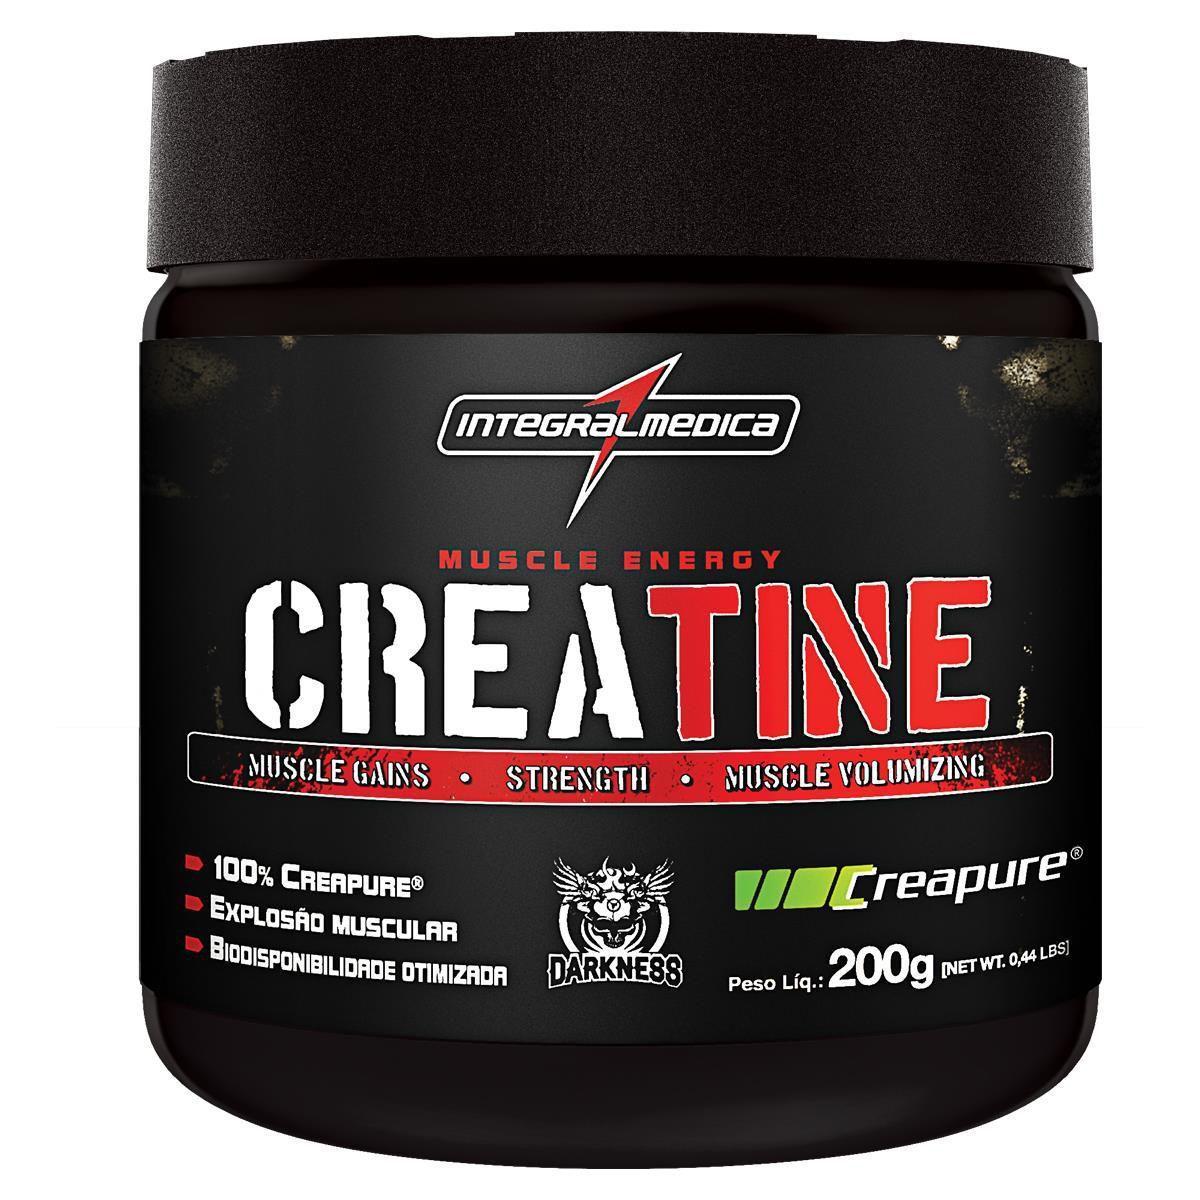 Creatine Creapure 200g Darkness - Integral Medica  - KFit Nutrition